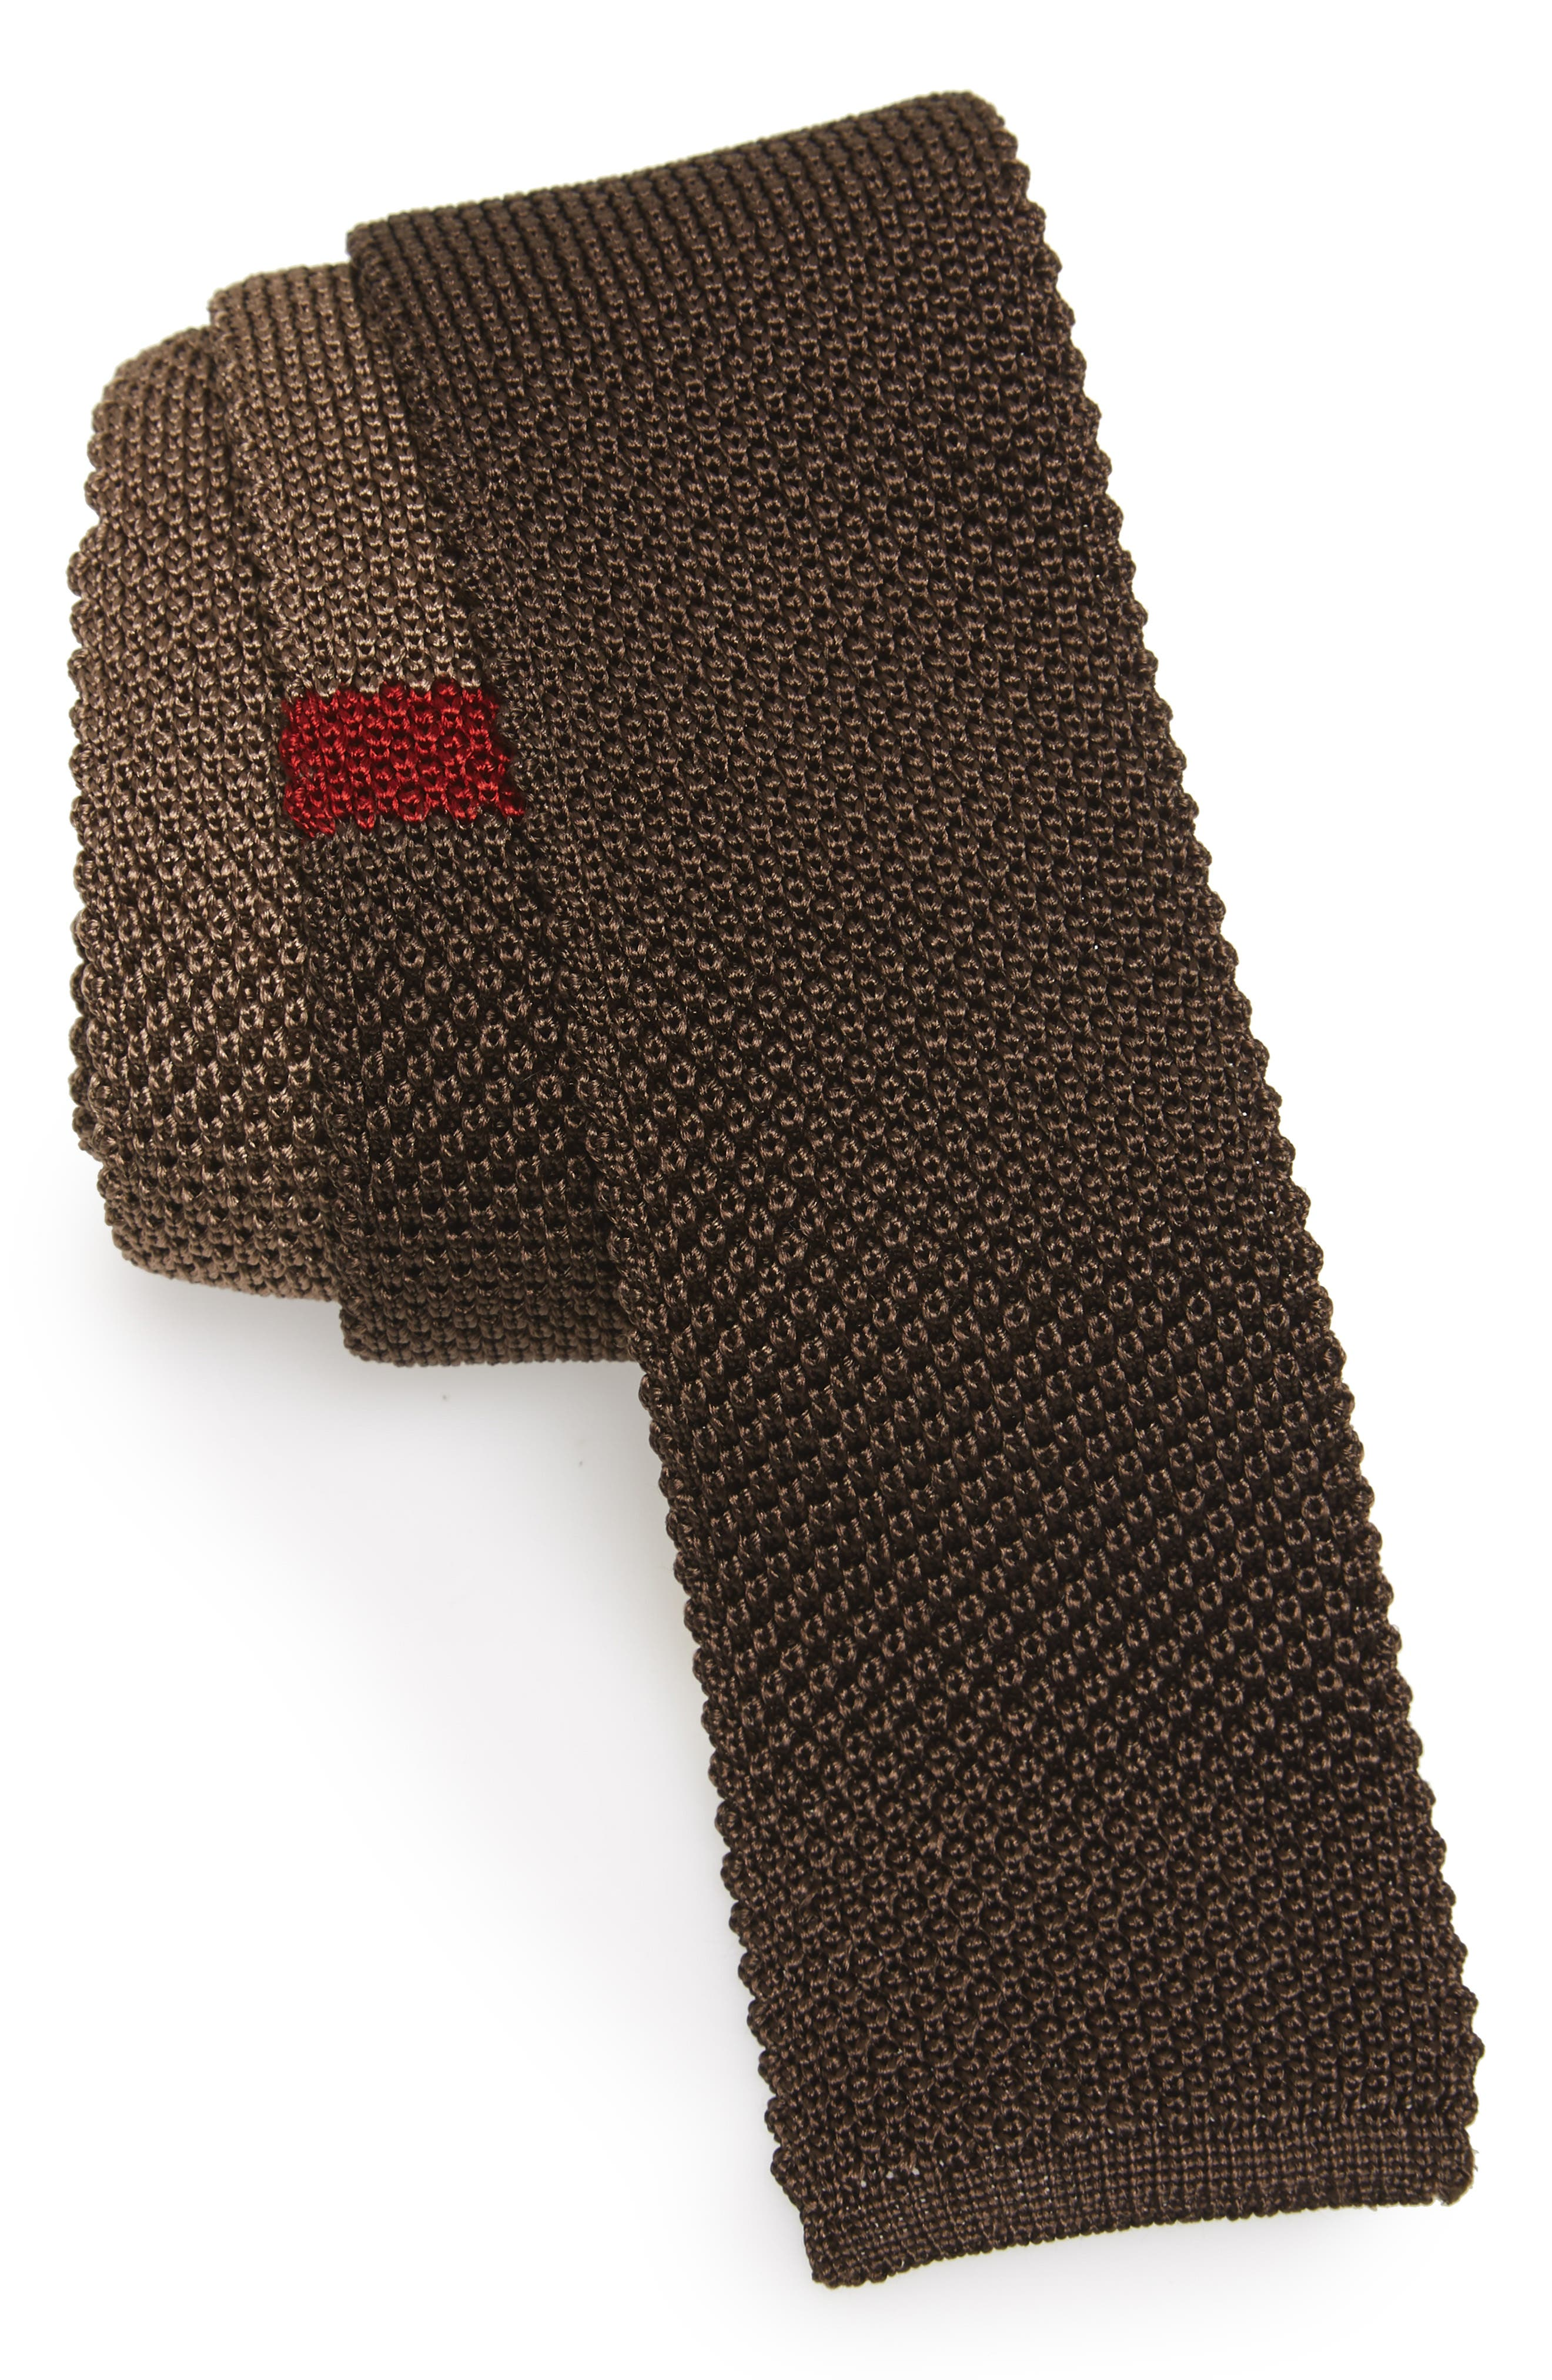 Salvatore Ferragamo Egeo Knit Silk Tie